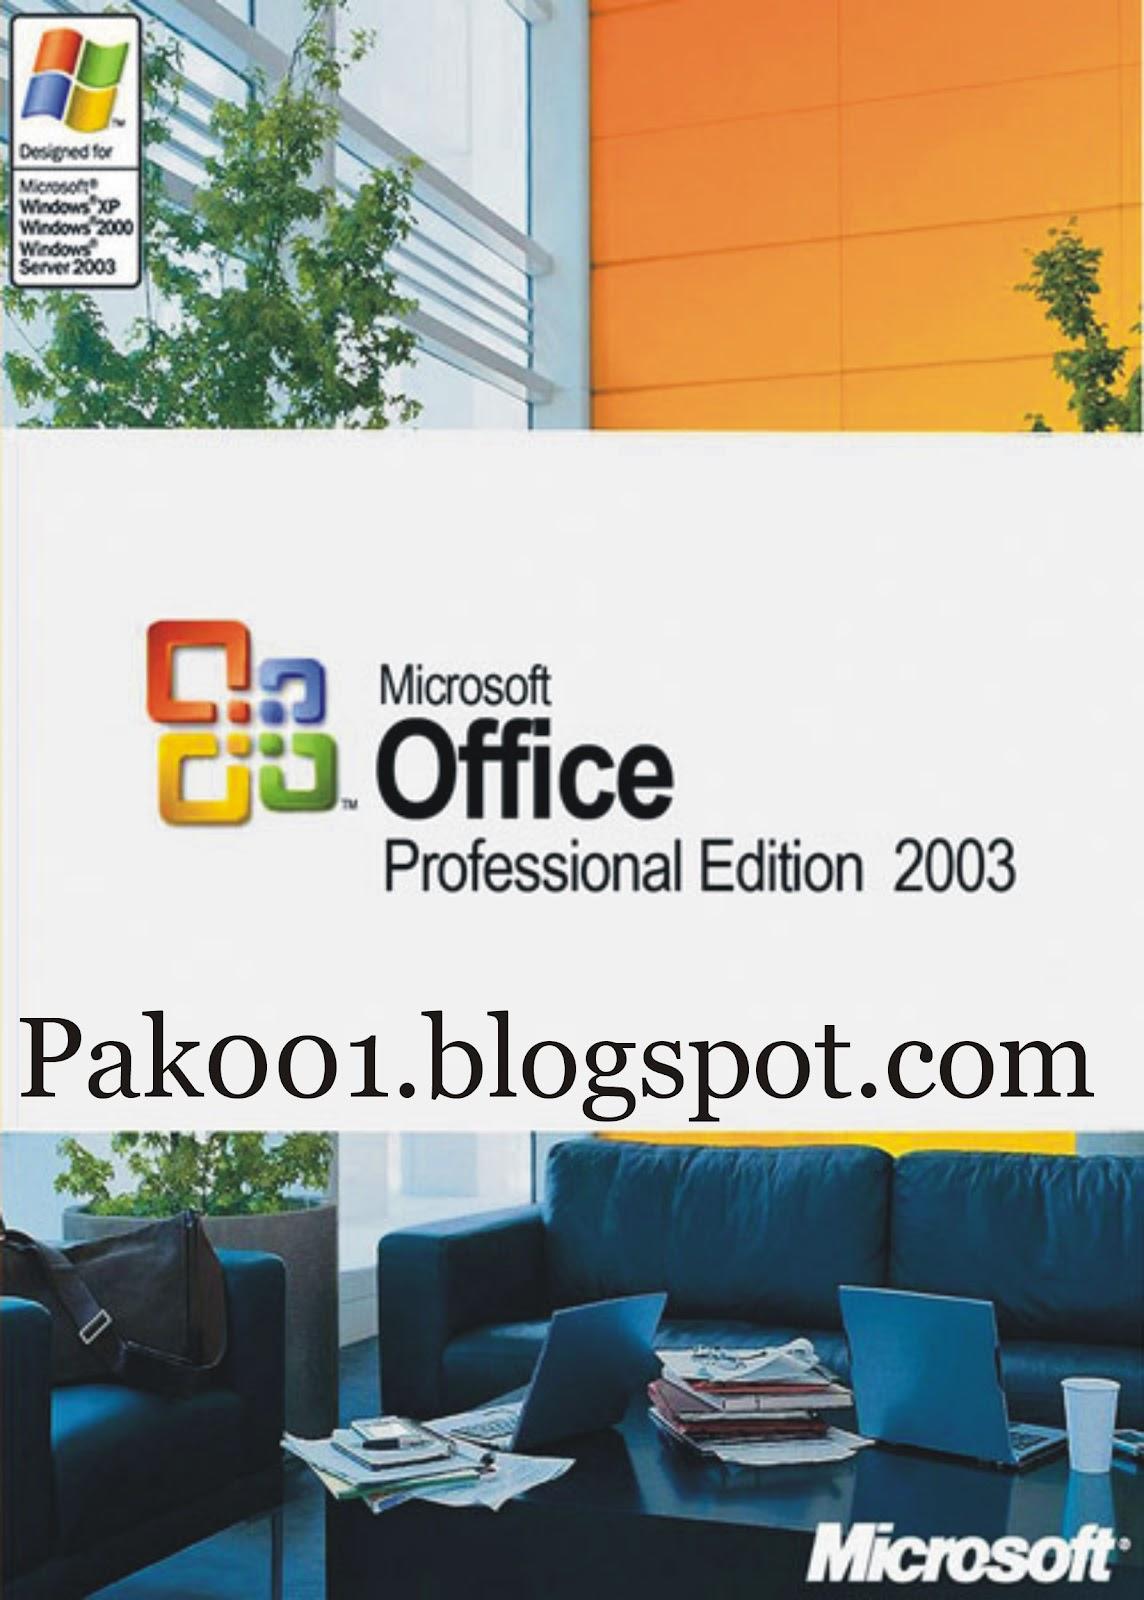 Professional Plus 2010 (Retail Edition) 64-Bit (x64) Full Version